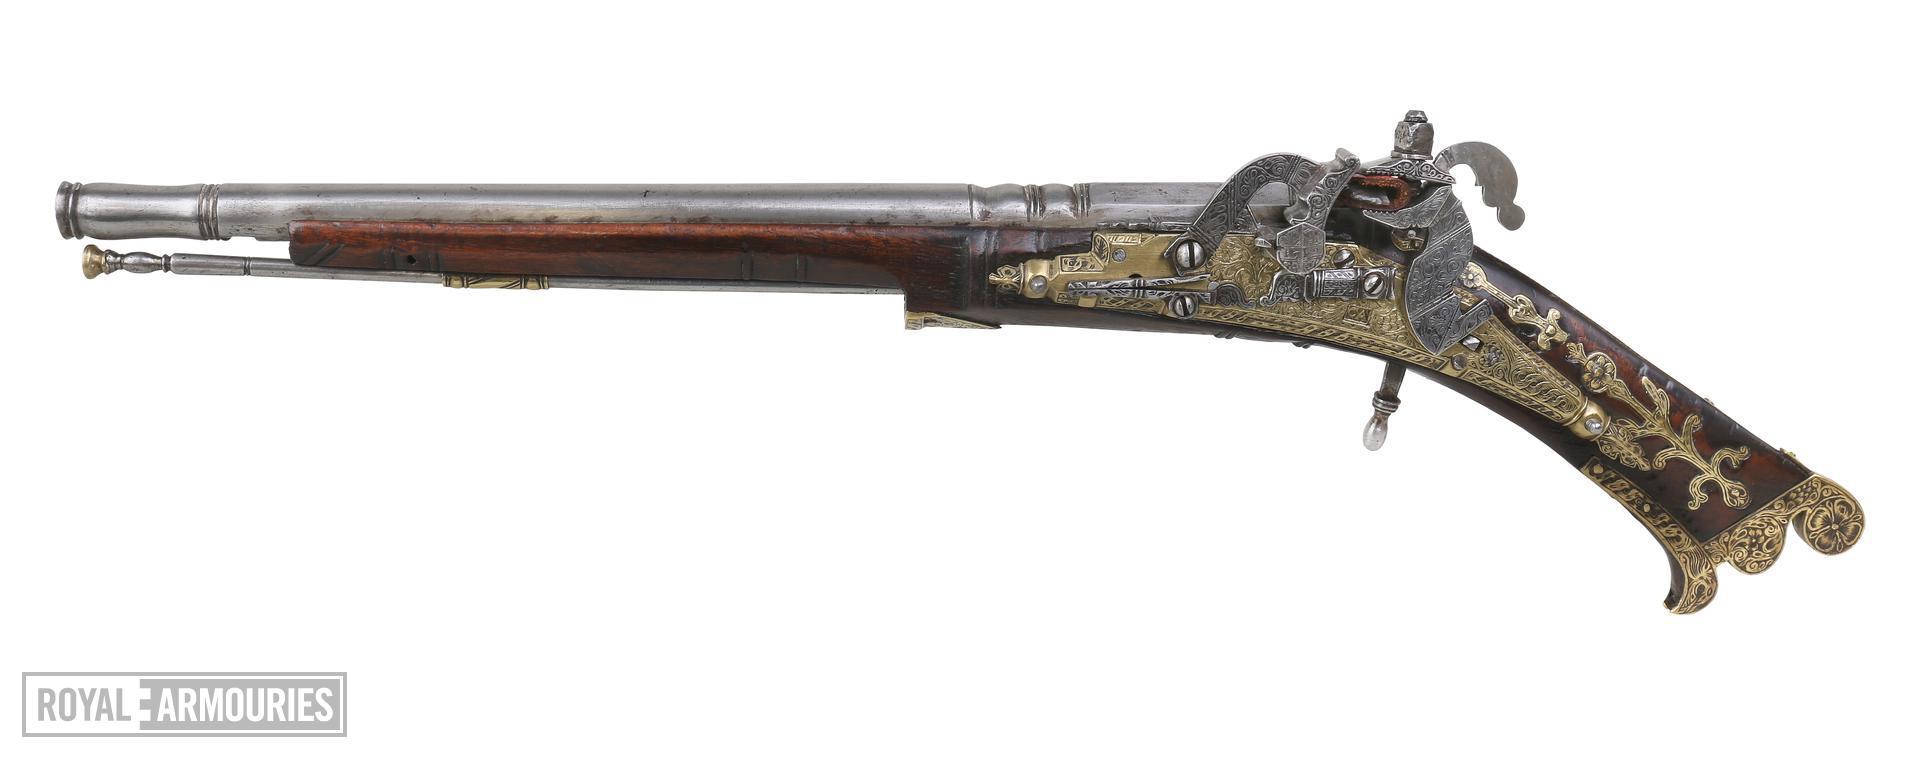 Snaphaunce muzzle-loading pistol - By Allison